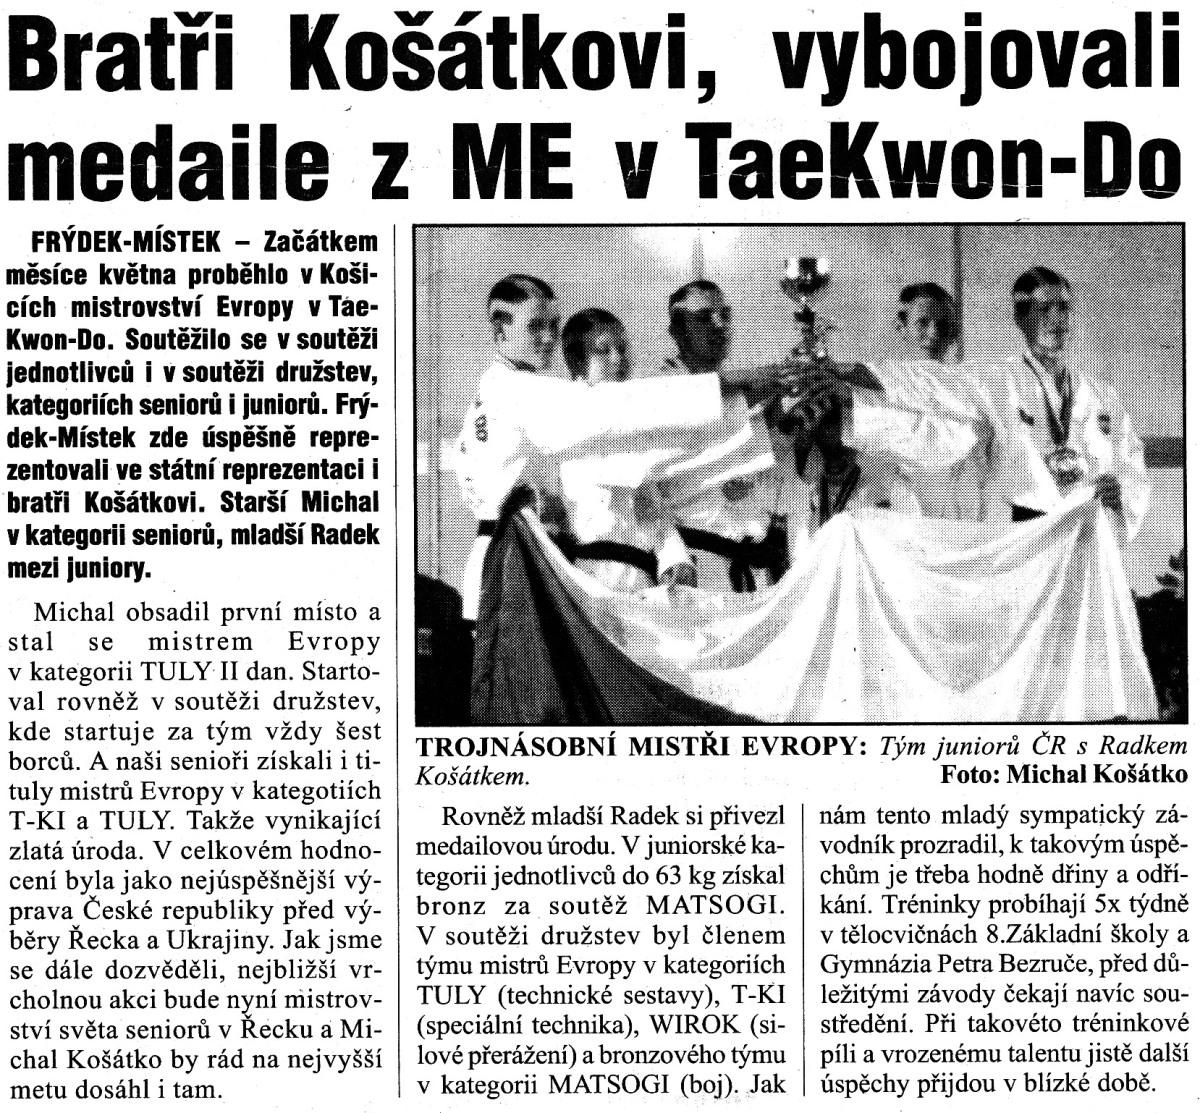 European Championship 2003 (Czech Republic, 2003)